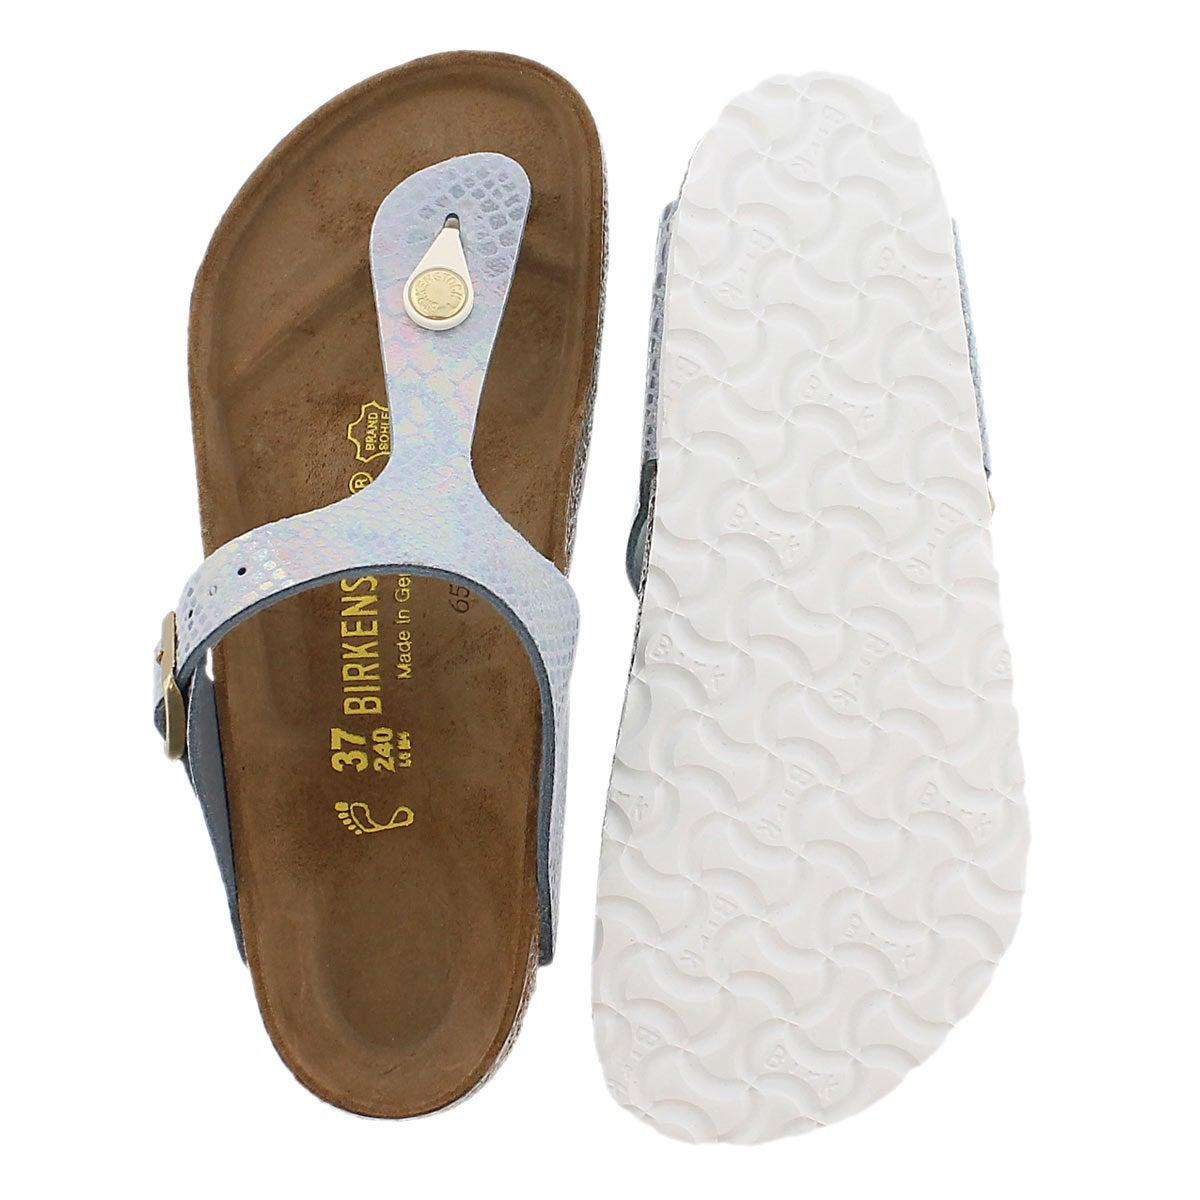 Lds Gizeh shiney snake sky thong sandal